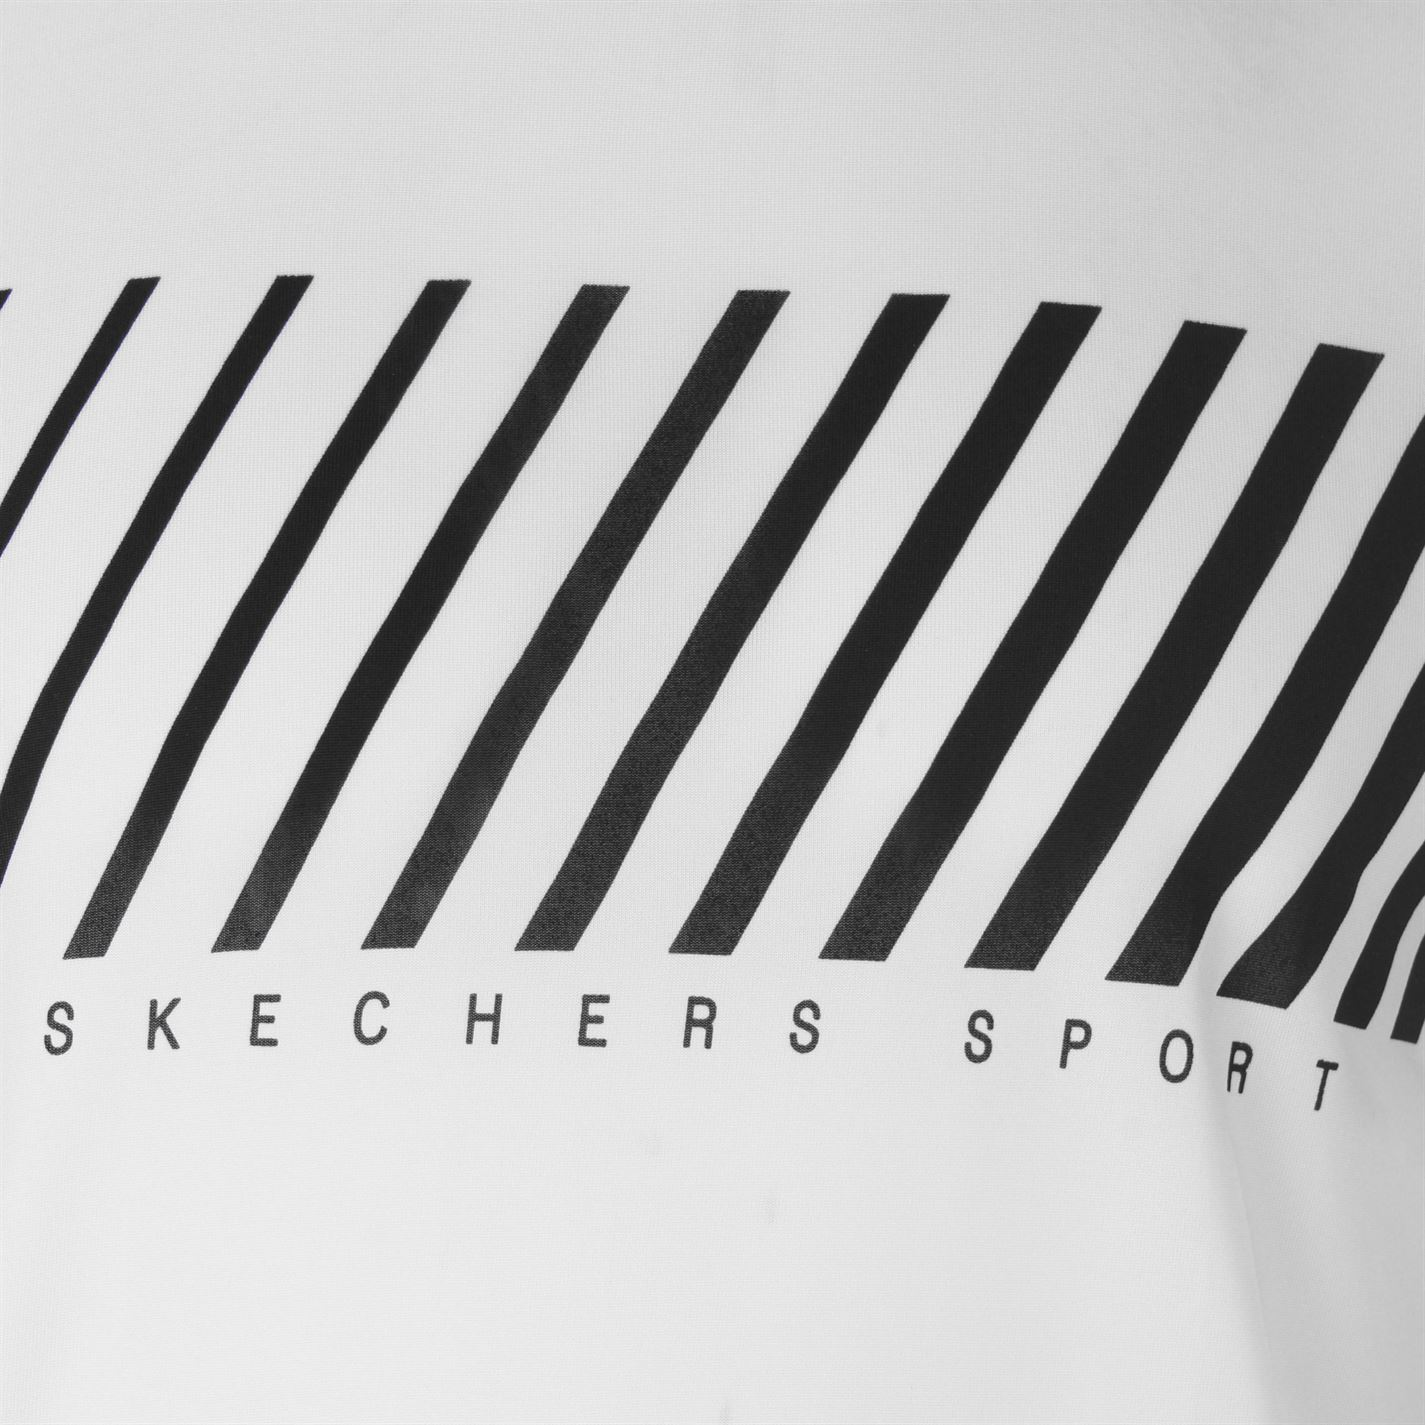 Skechers-Mens-Rendimiento-Grafico-camiseta-Manga-Corta-Camiseta-Top-Cuello-Redondo miniatura 7